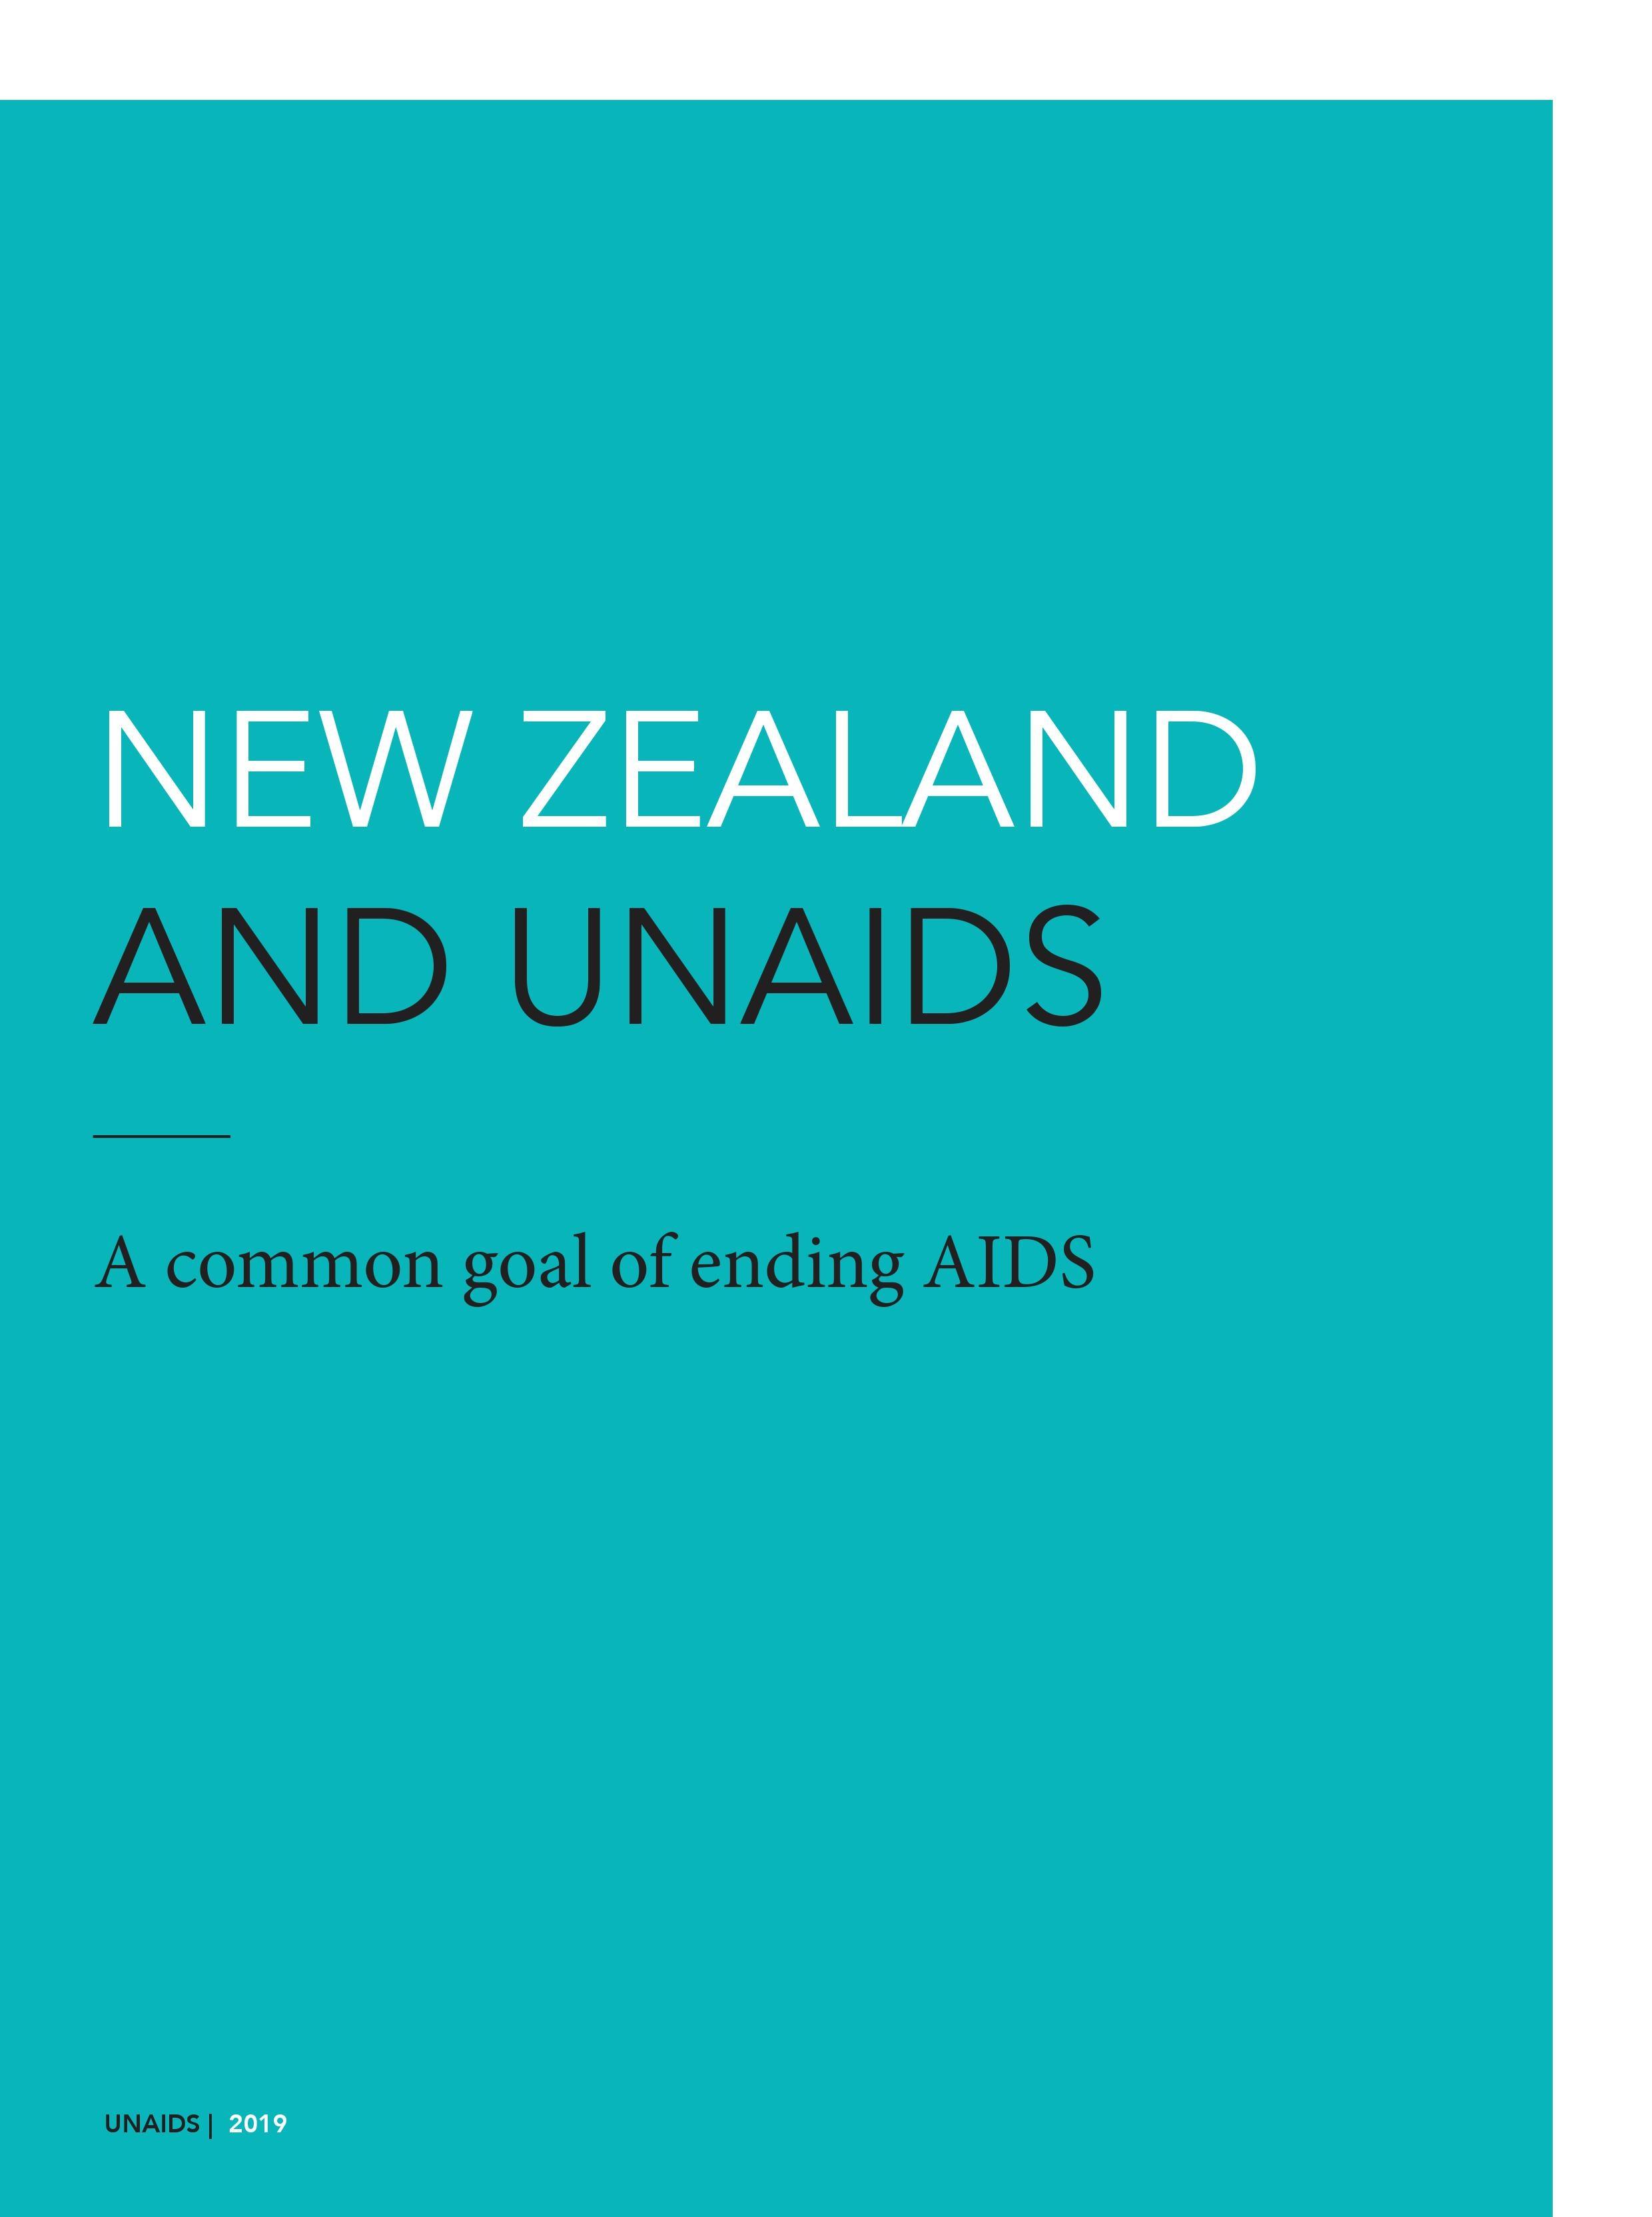 New Zealand and UNAIDS